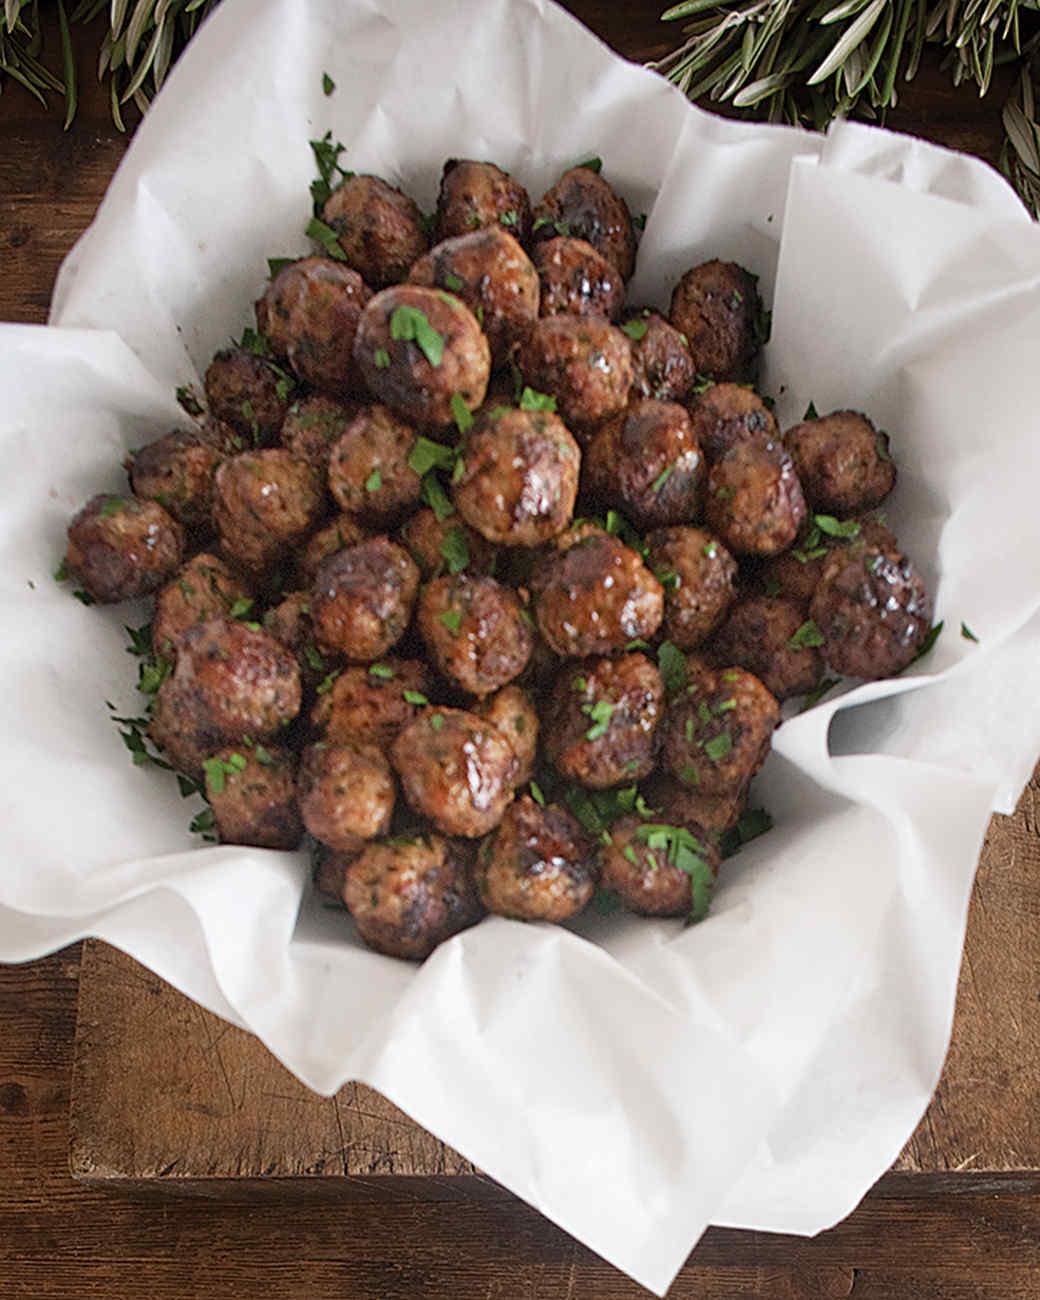 mld105721_0610_meatballs.jpg